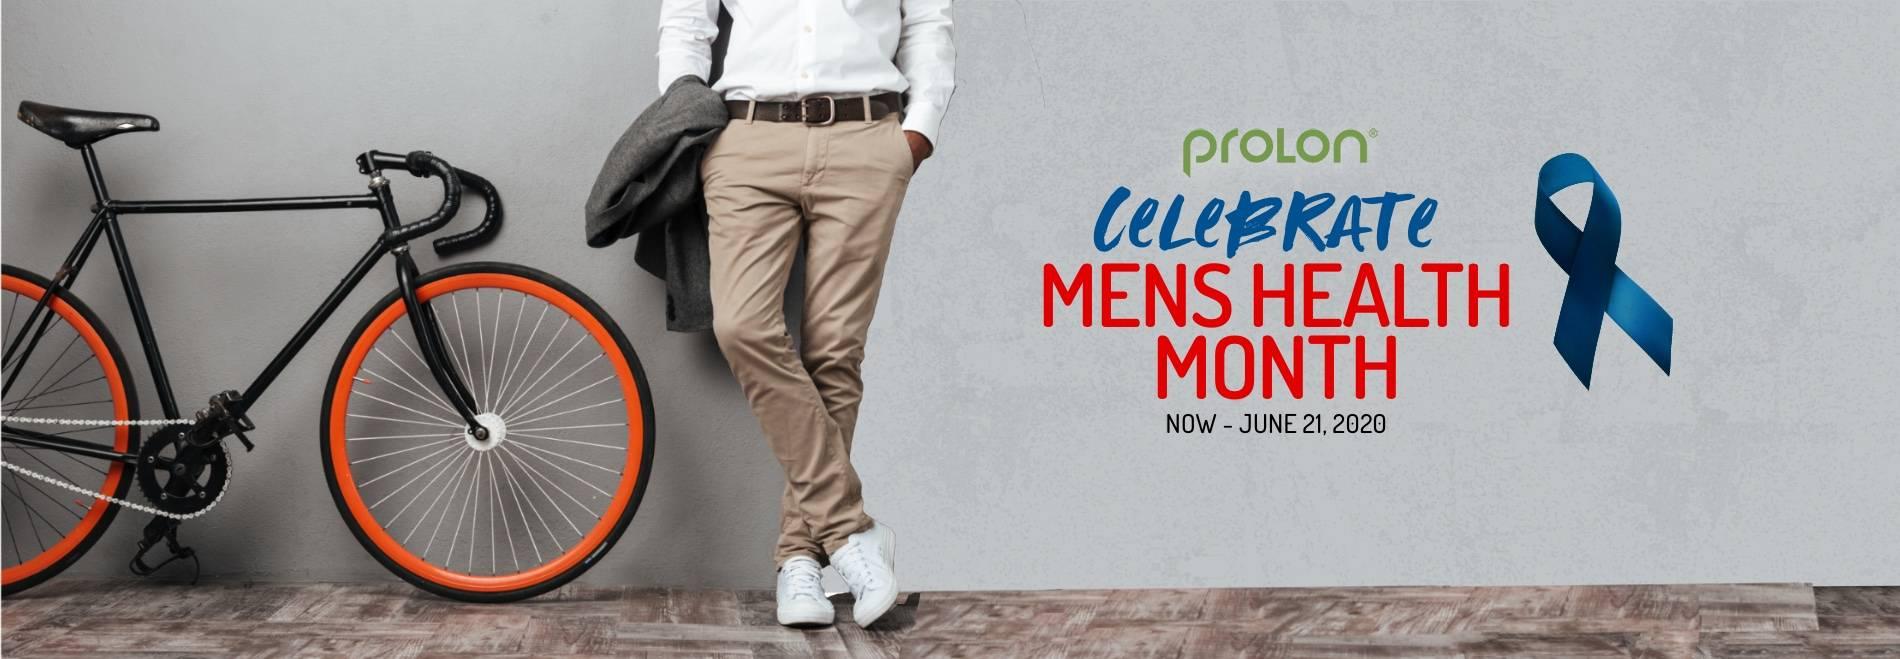 ProLon Celebrate Mens Health Month